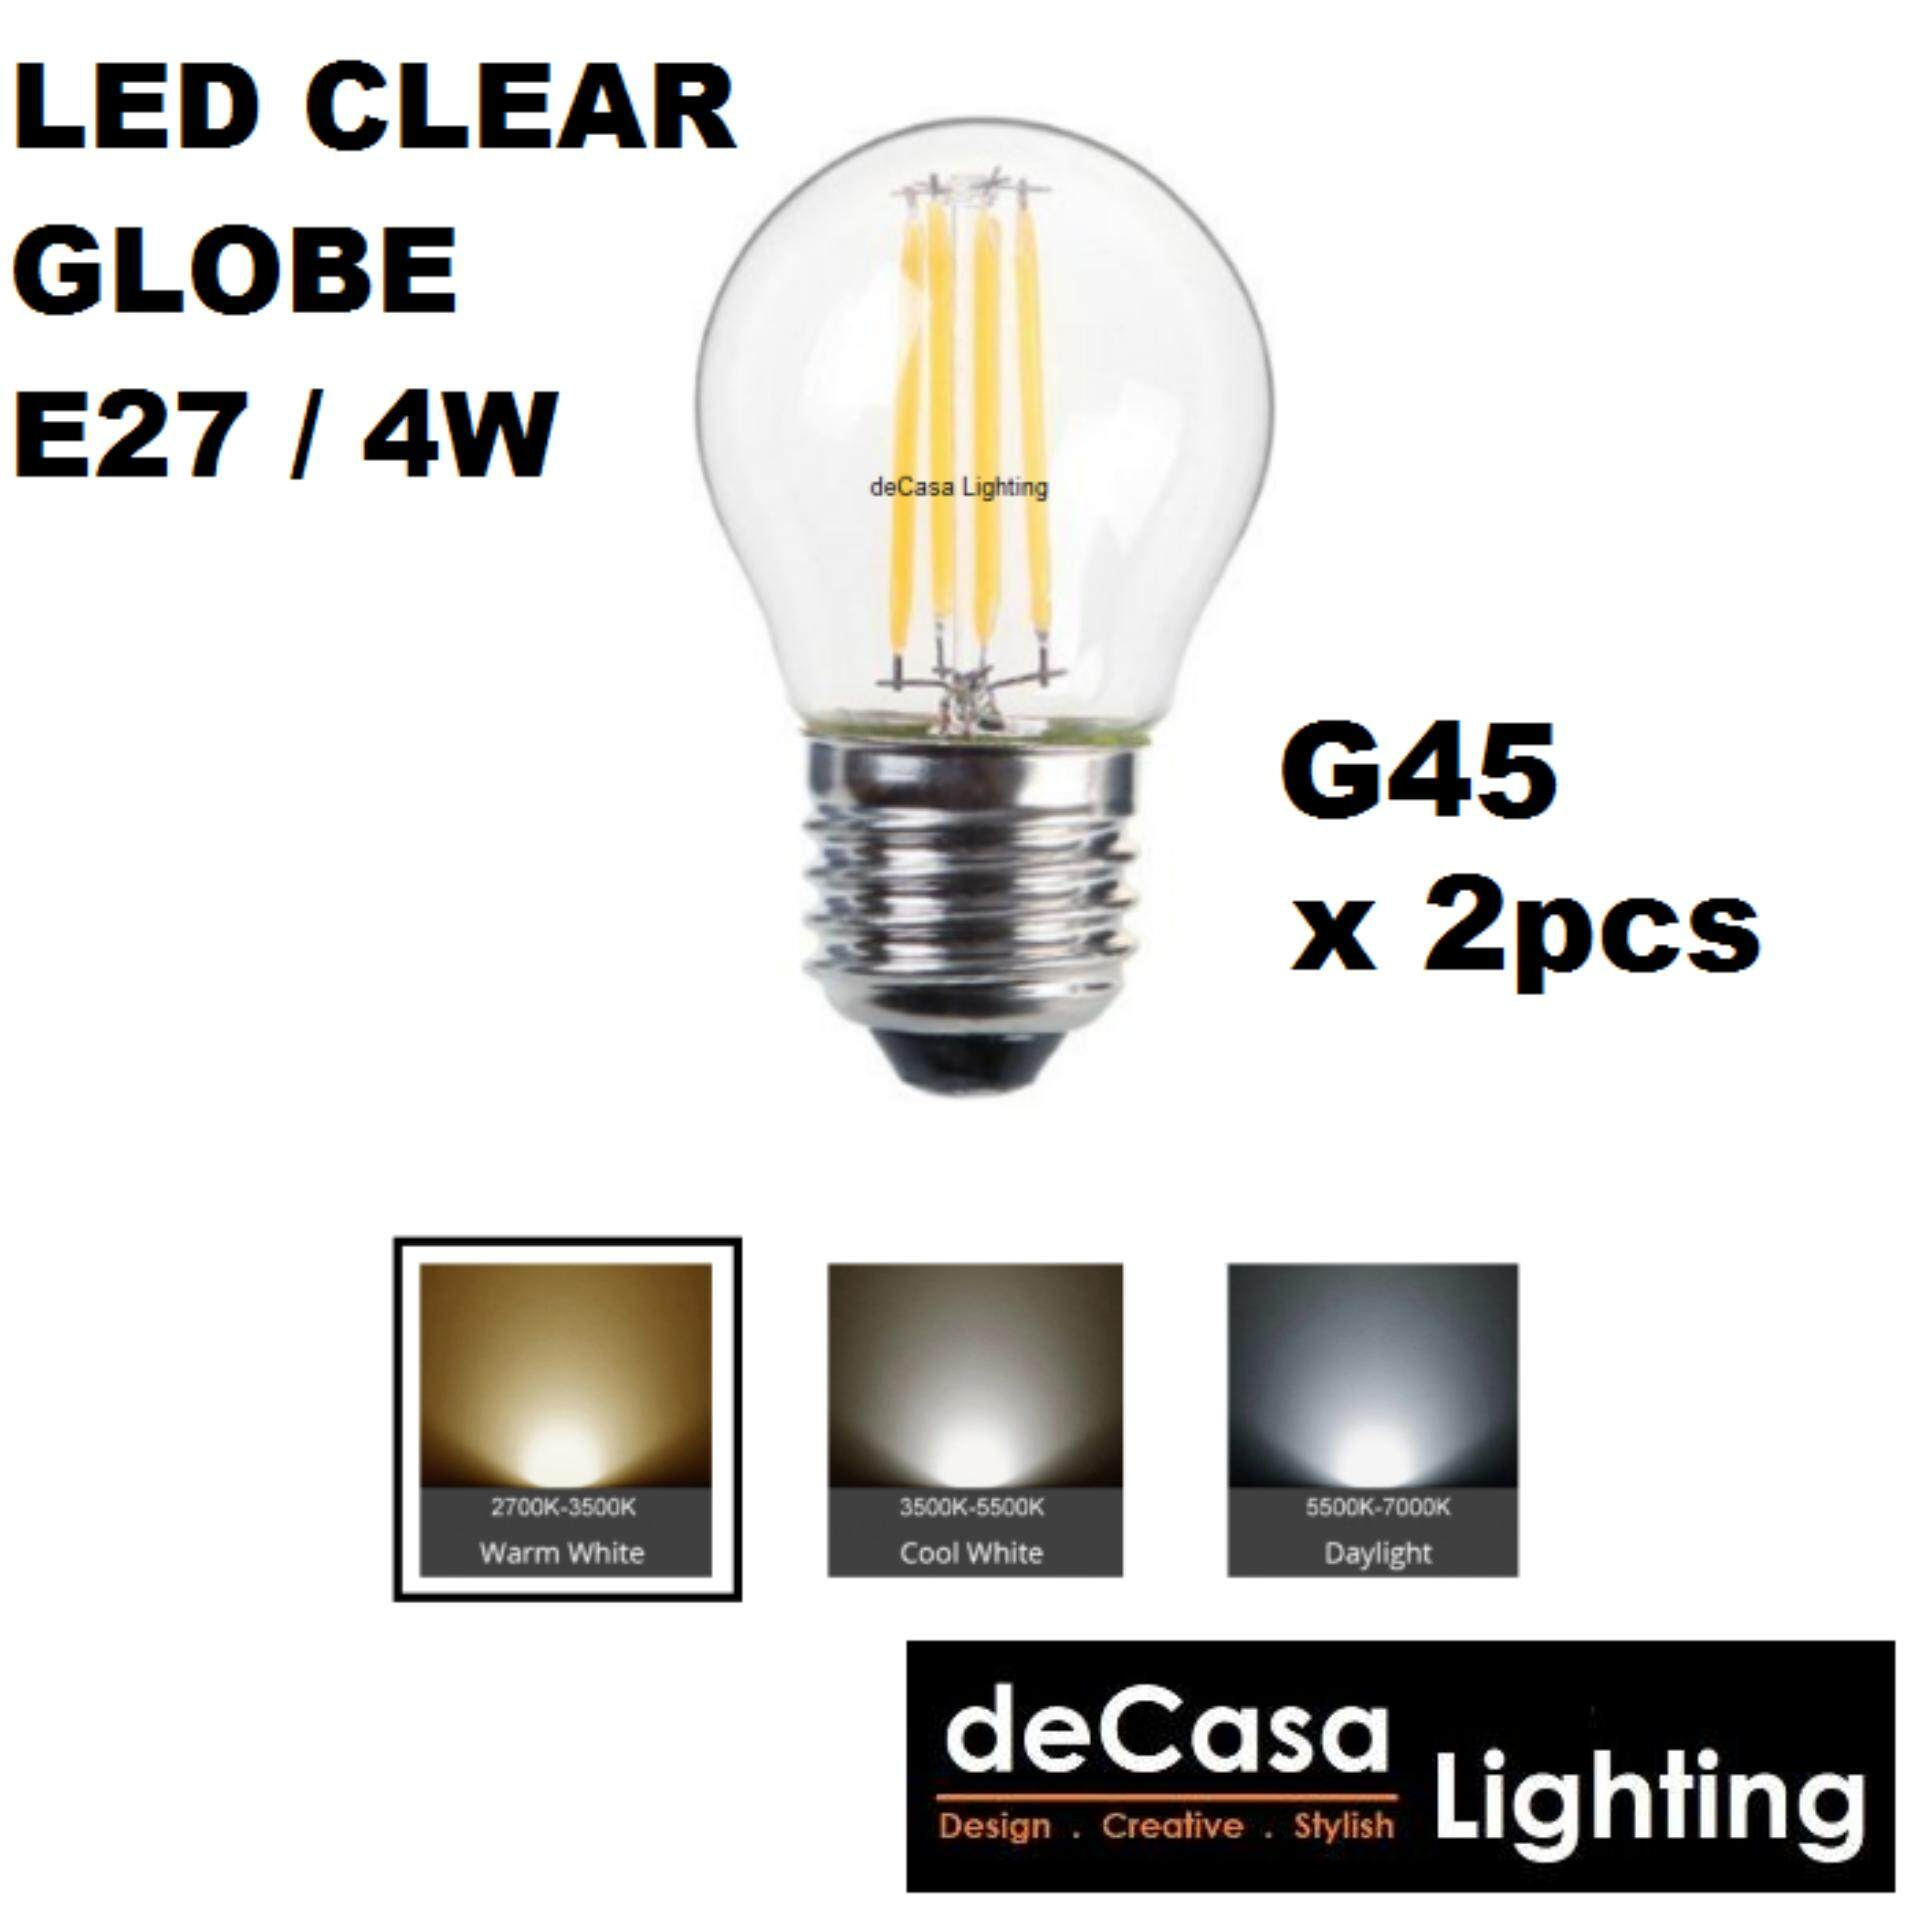 2pcs Leb Bulb E27 Clear Globe Bulb 4w Edison Ping Pong Bulb Daylight/WARM WHITE (LY-G45-4W)